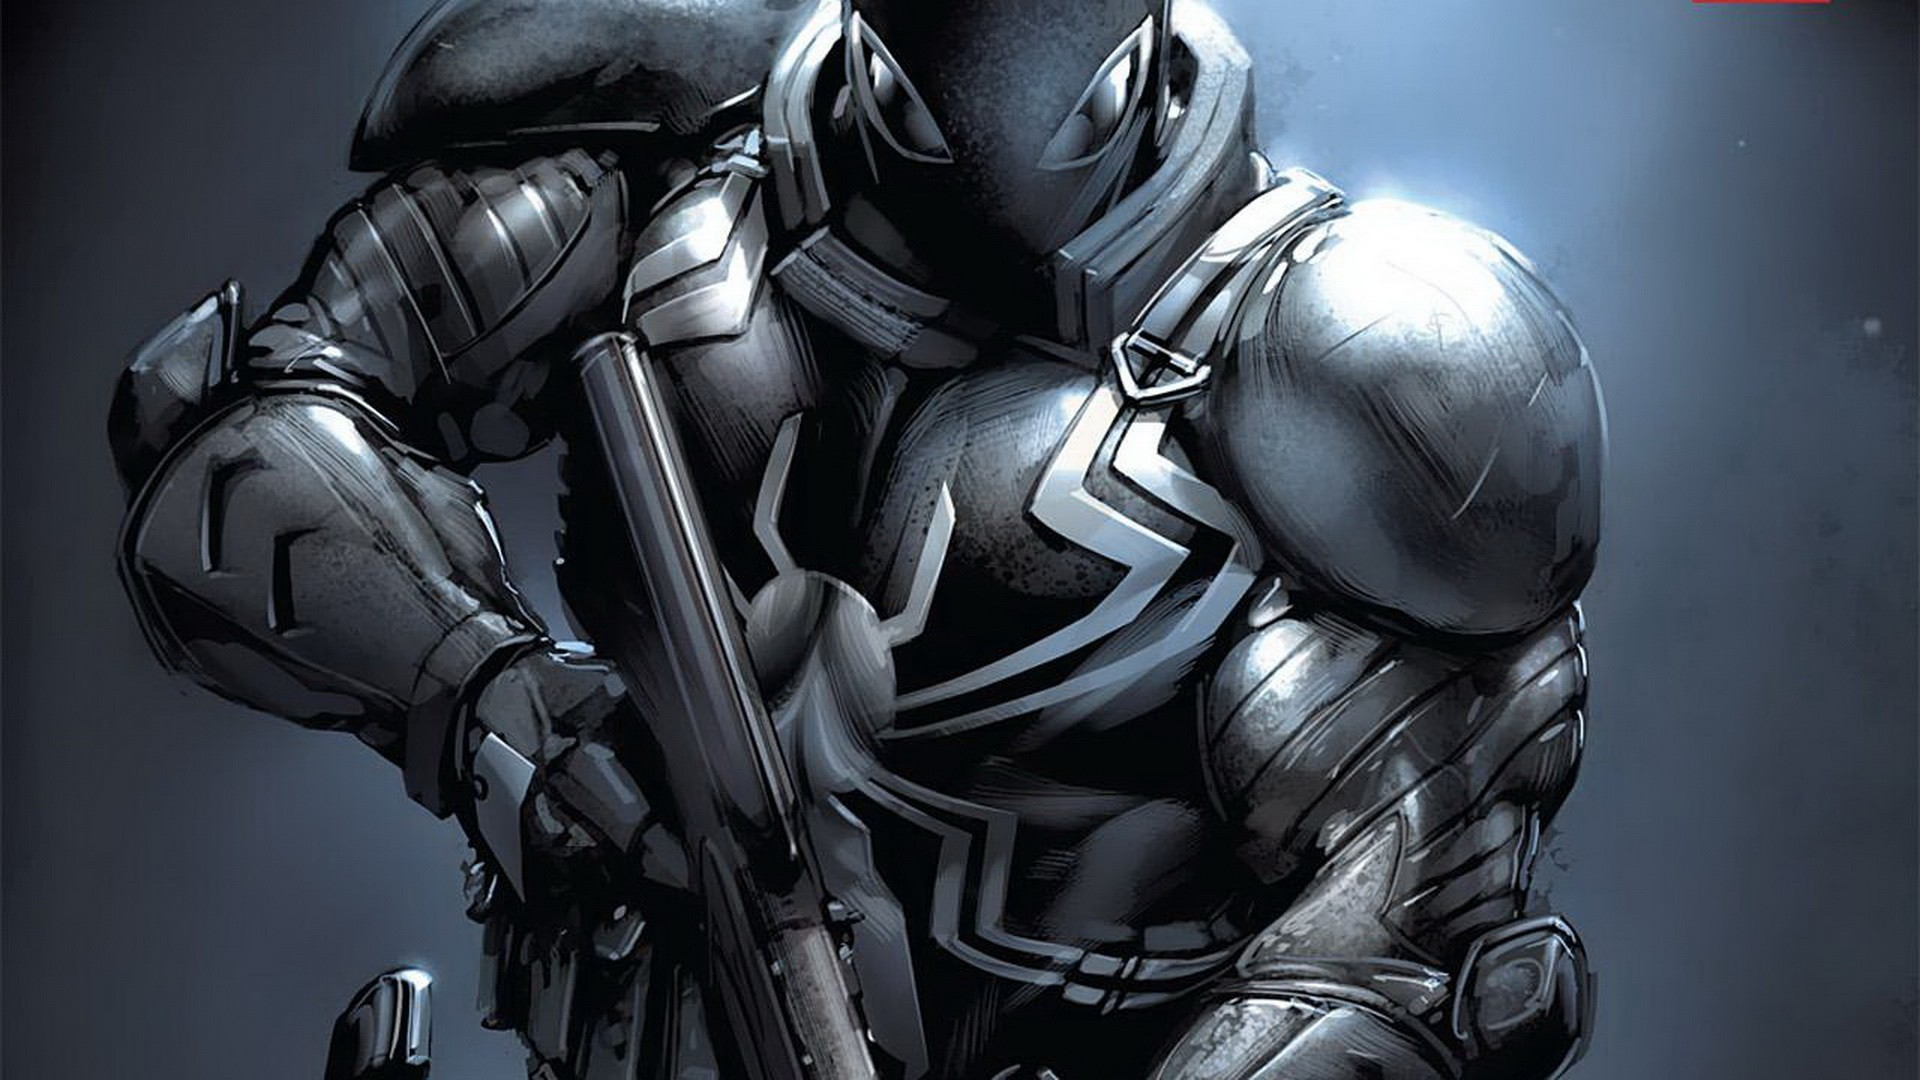 Agent Venom vs. Wolverine, Sabre-tooth, X-23, Daken & Deadpool (just  because)!